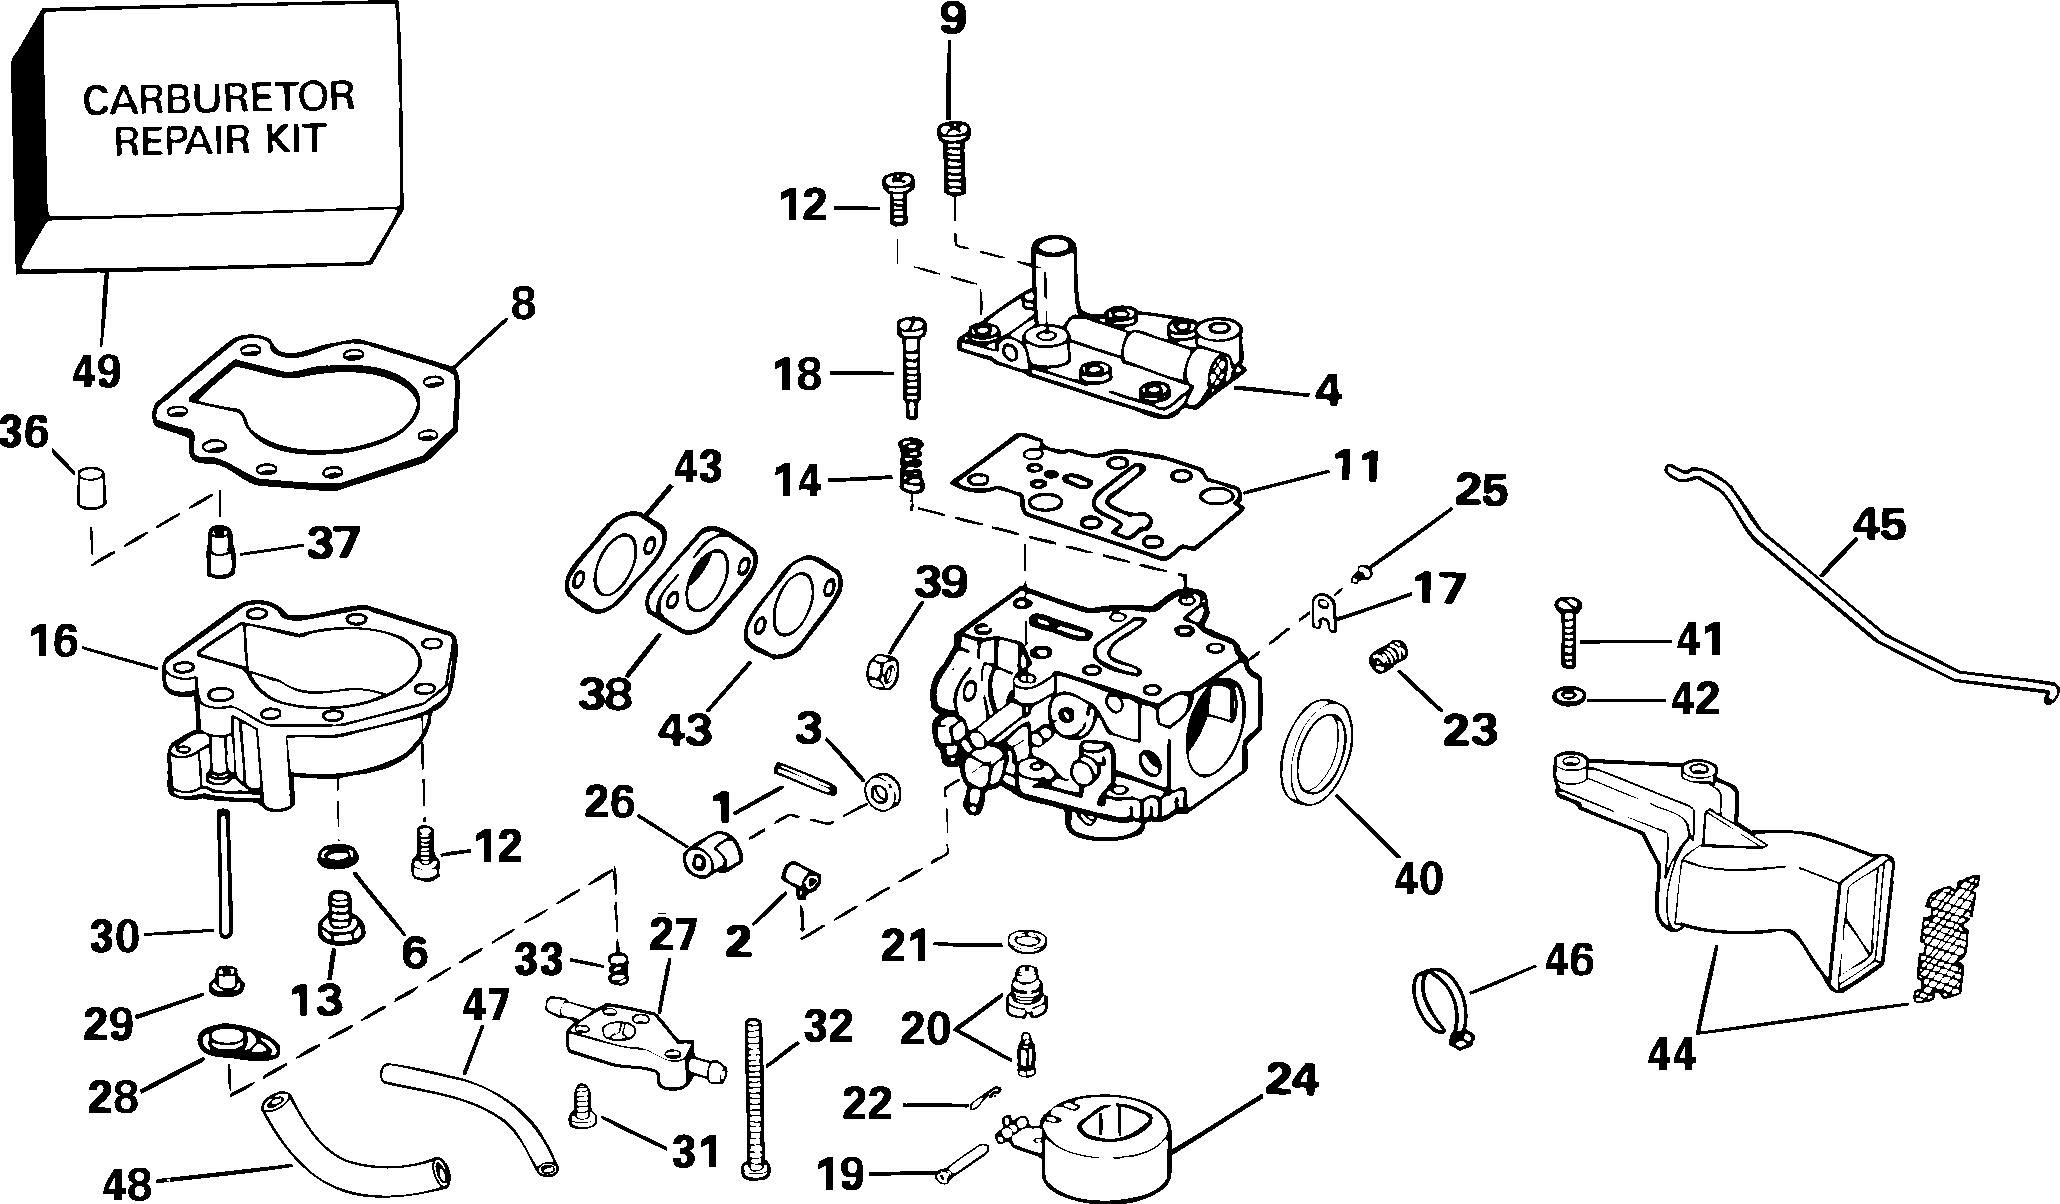 2003 suzuki xl7 fuse box location